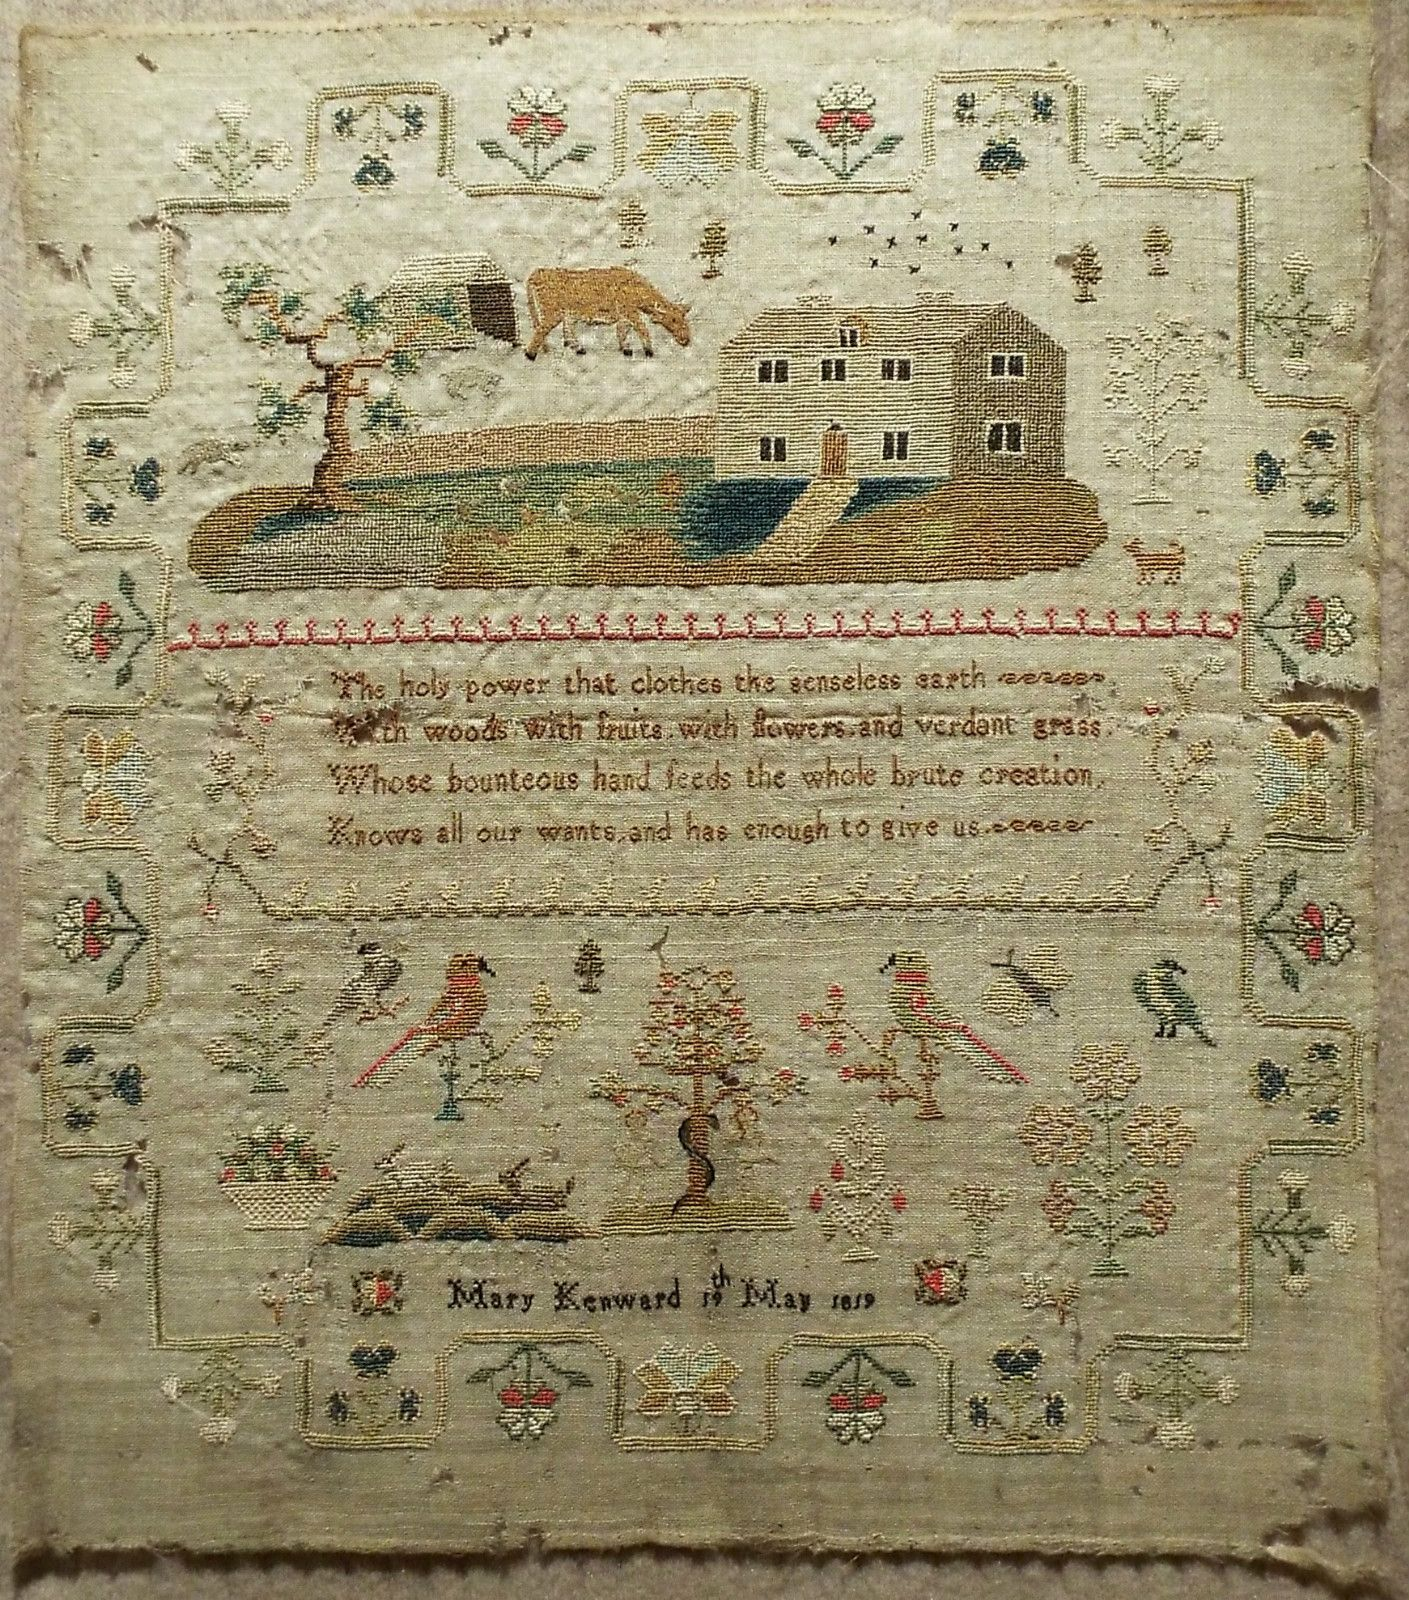 Early 19th Century Linen Silk Adam Eve Sampler by Mary Kenward 1819   eBay